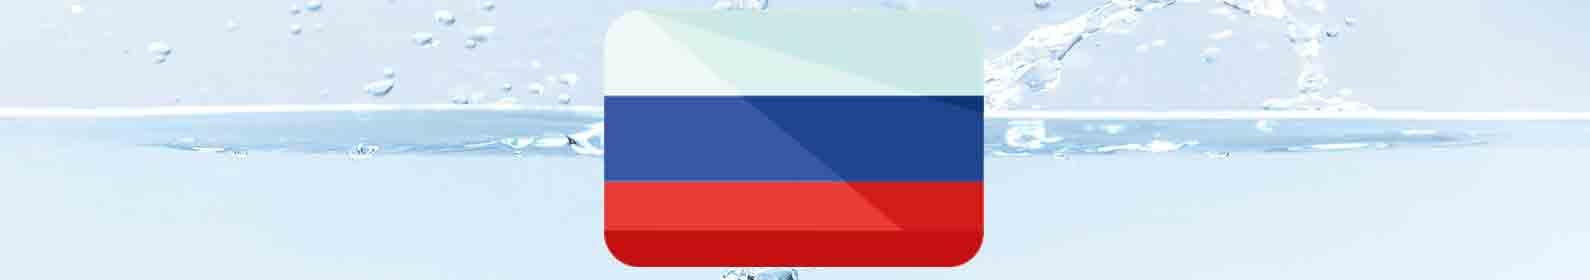 water-treatment-russia.jpg